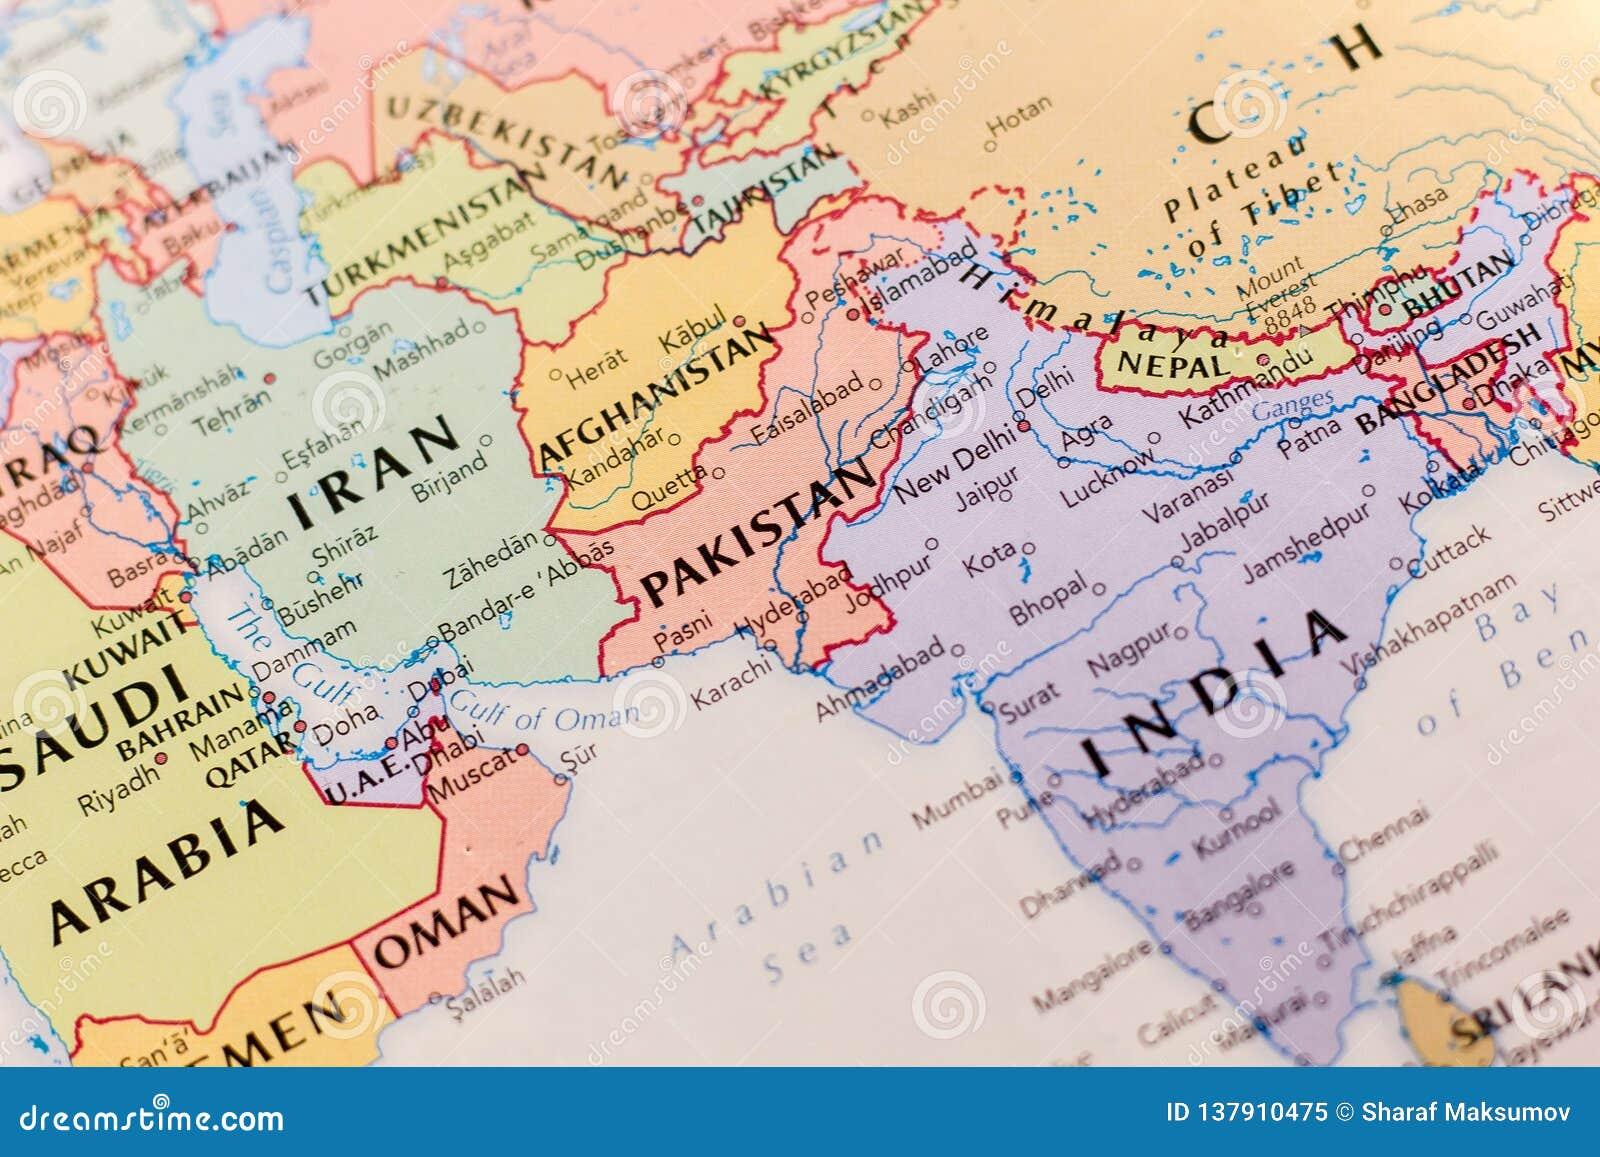 Karachi Map 2019